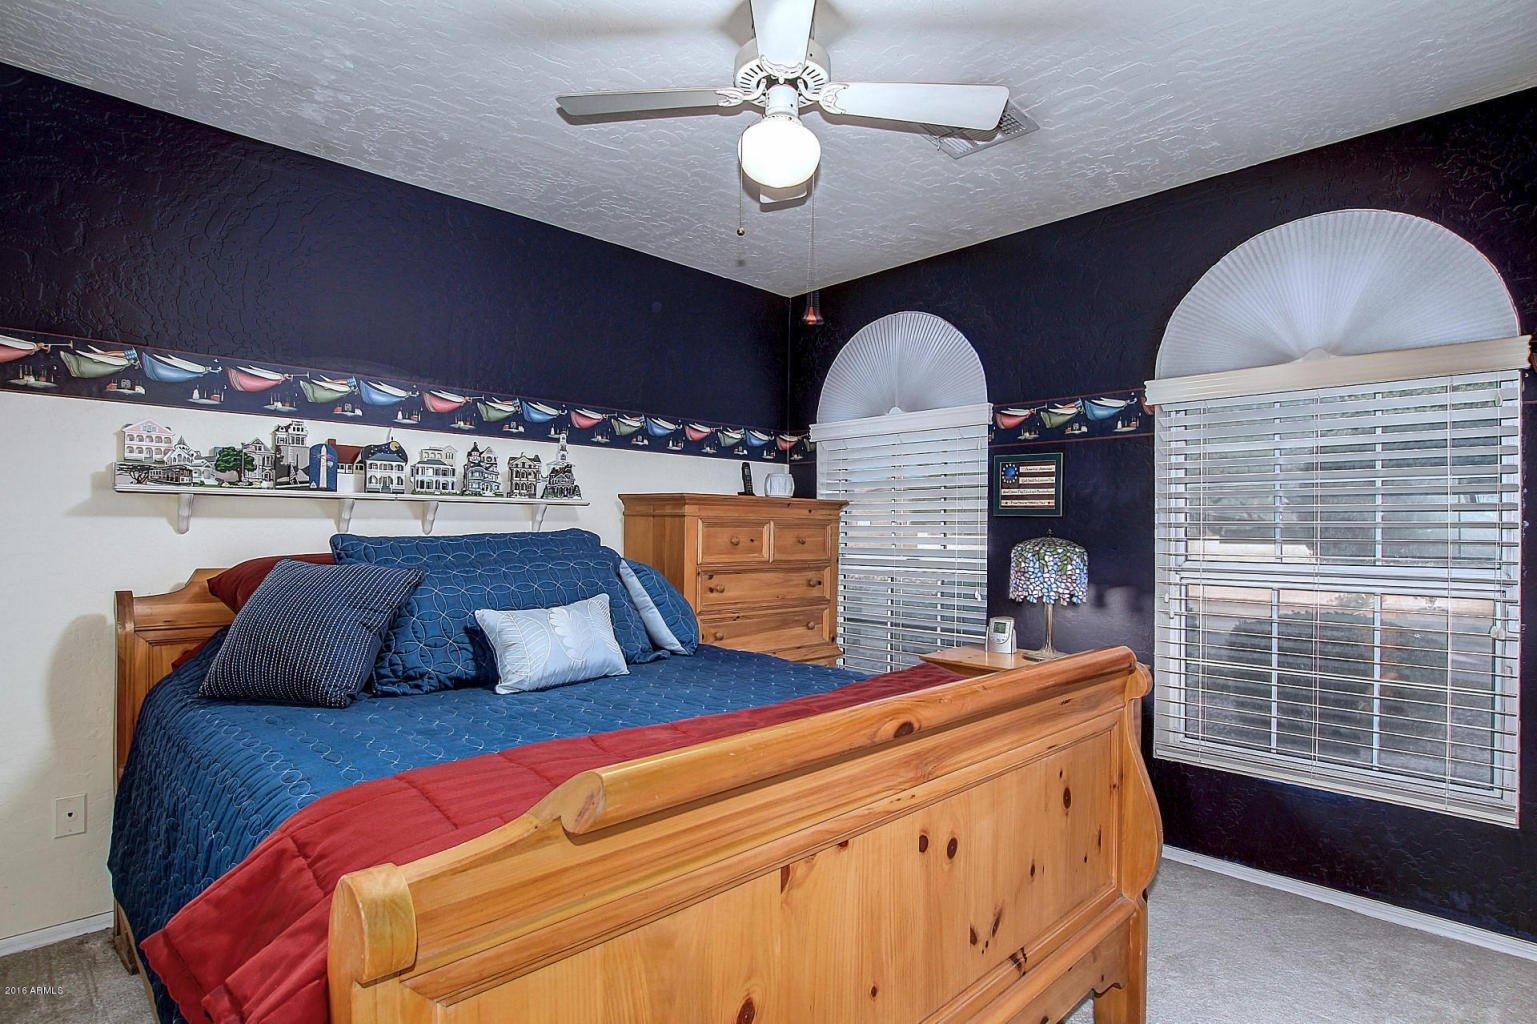 Photo 15: Photos: 3602 E Mountain Sky Avenue in Phoenix: Ahwatukee House for sale : MLS®# 5462780